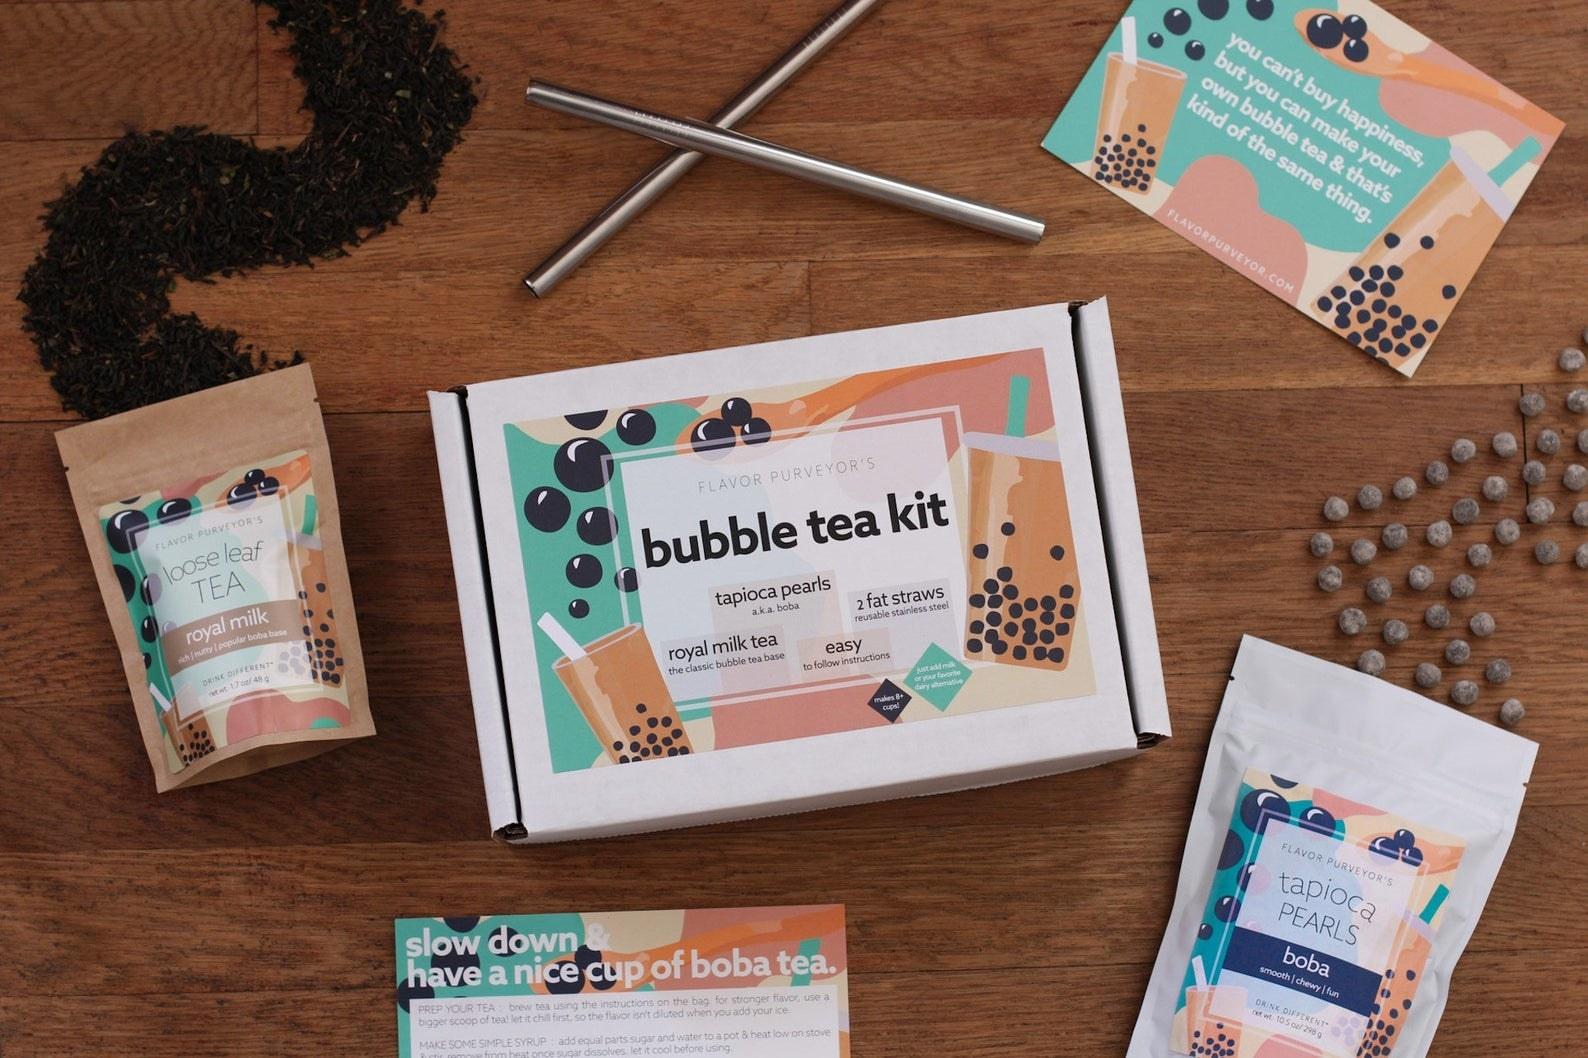 The kit in cartoon boba tea packaging